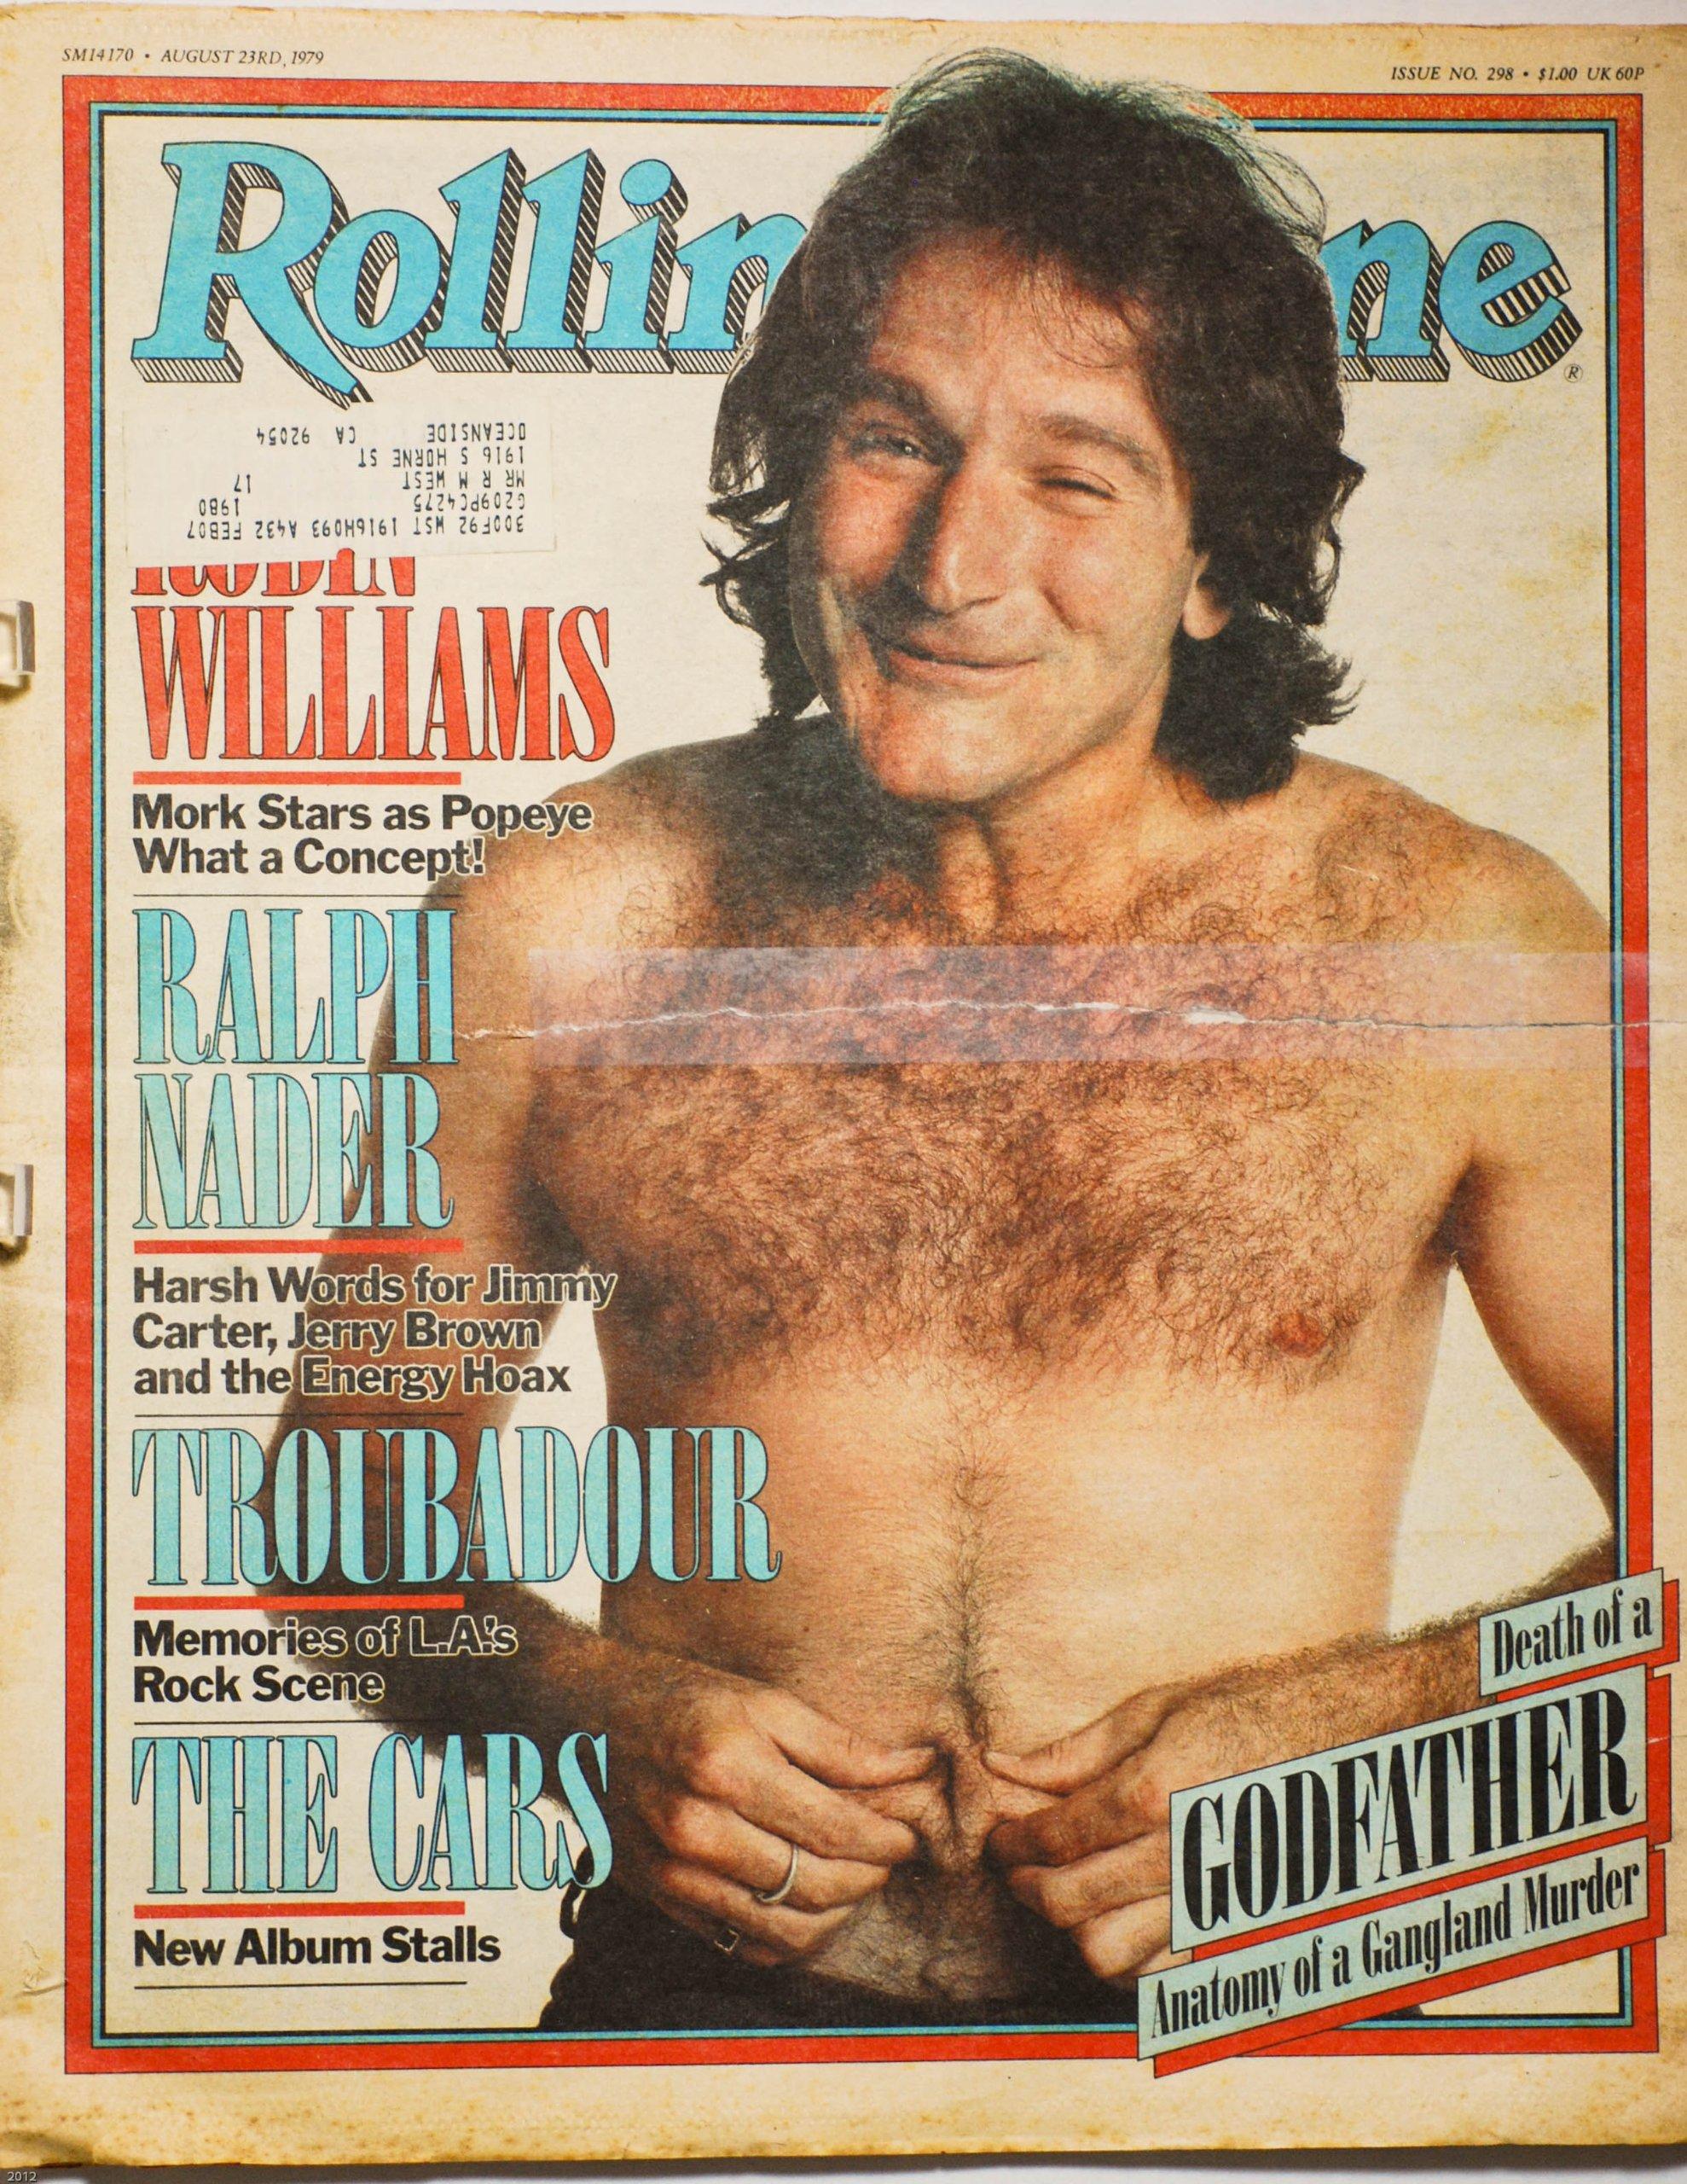 Rolling Stone Magazine: Aug. 23, 1979 Issue 298 - Robin Williams ...